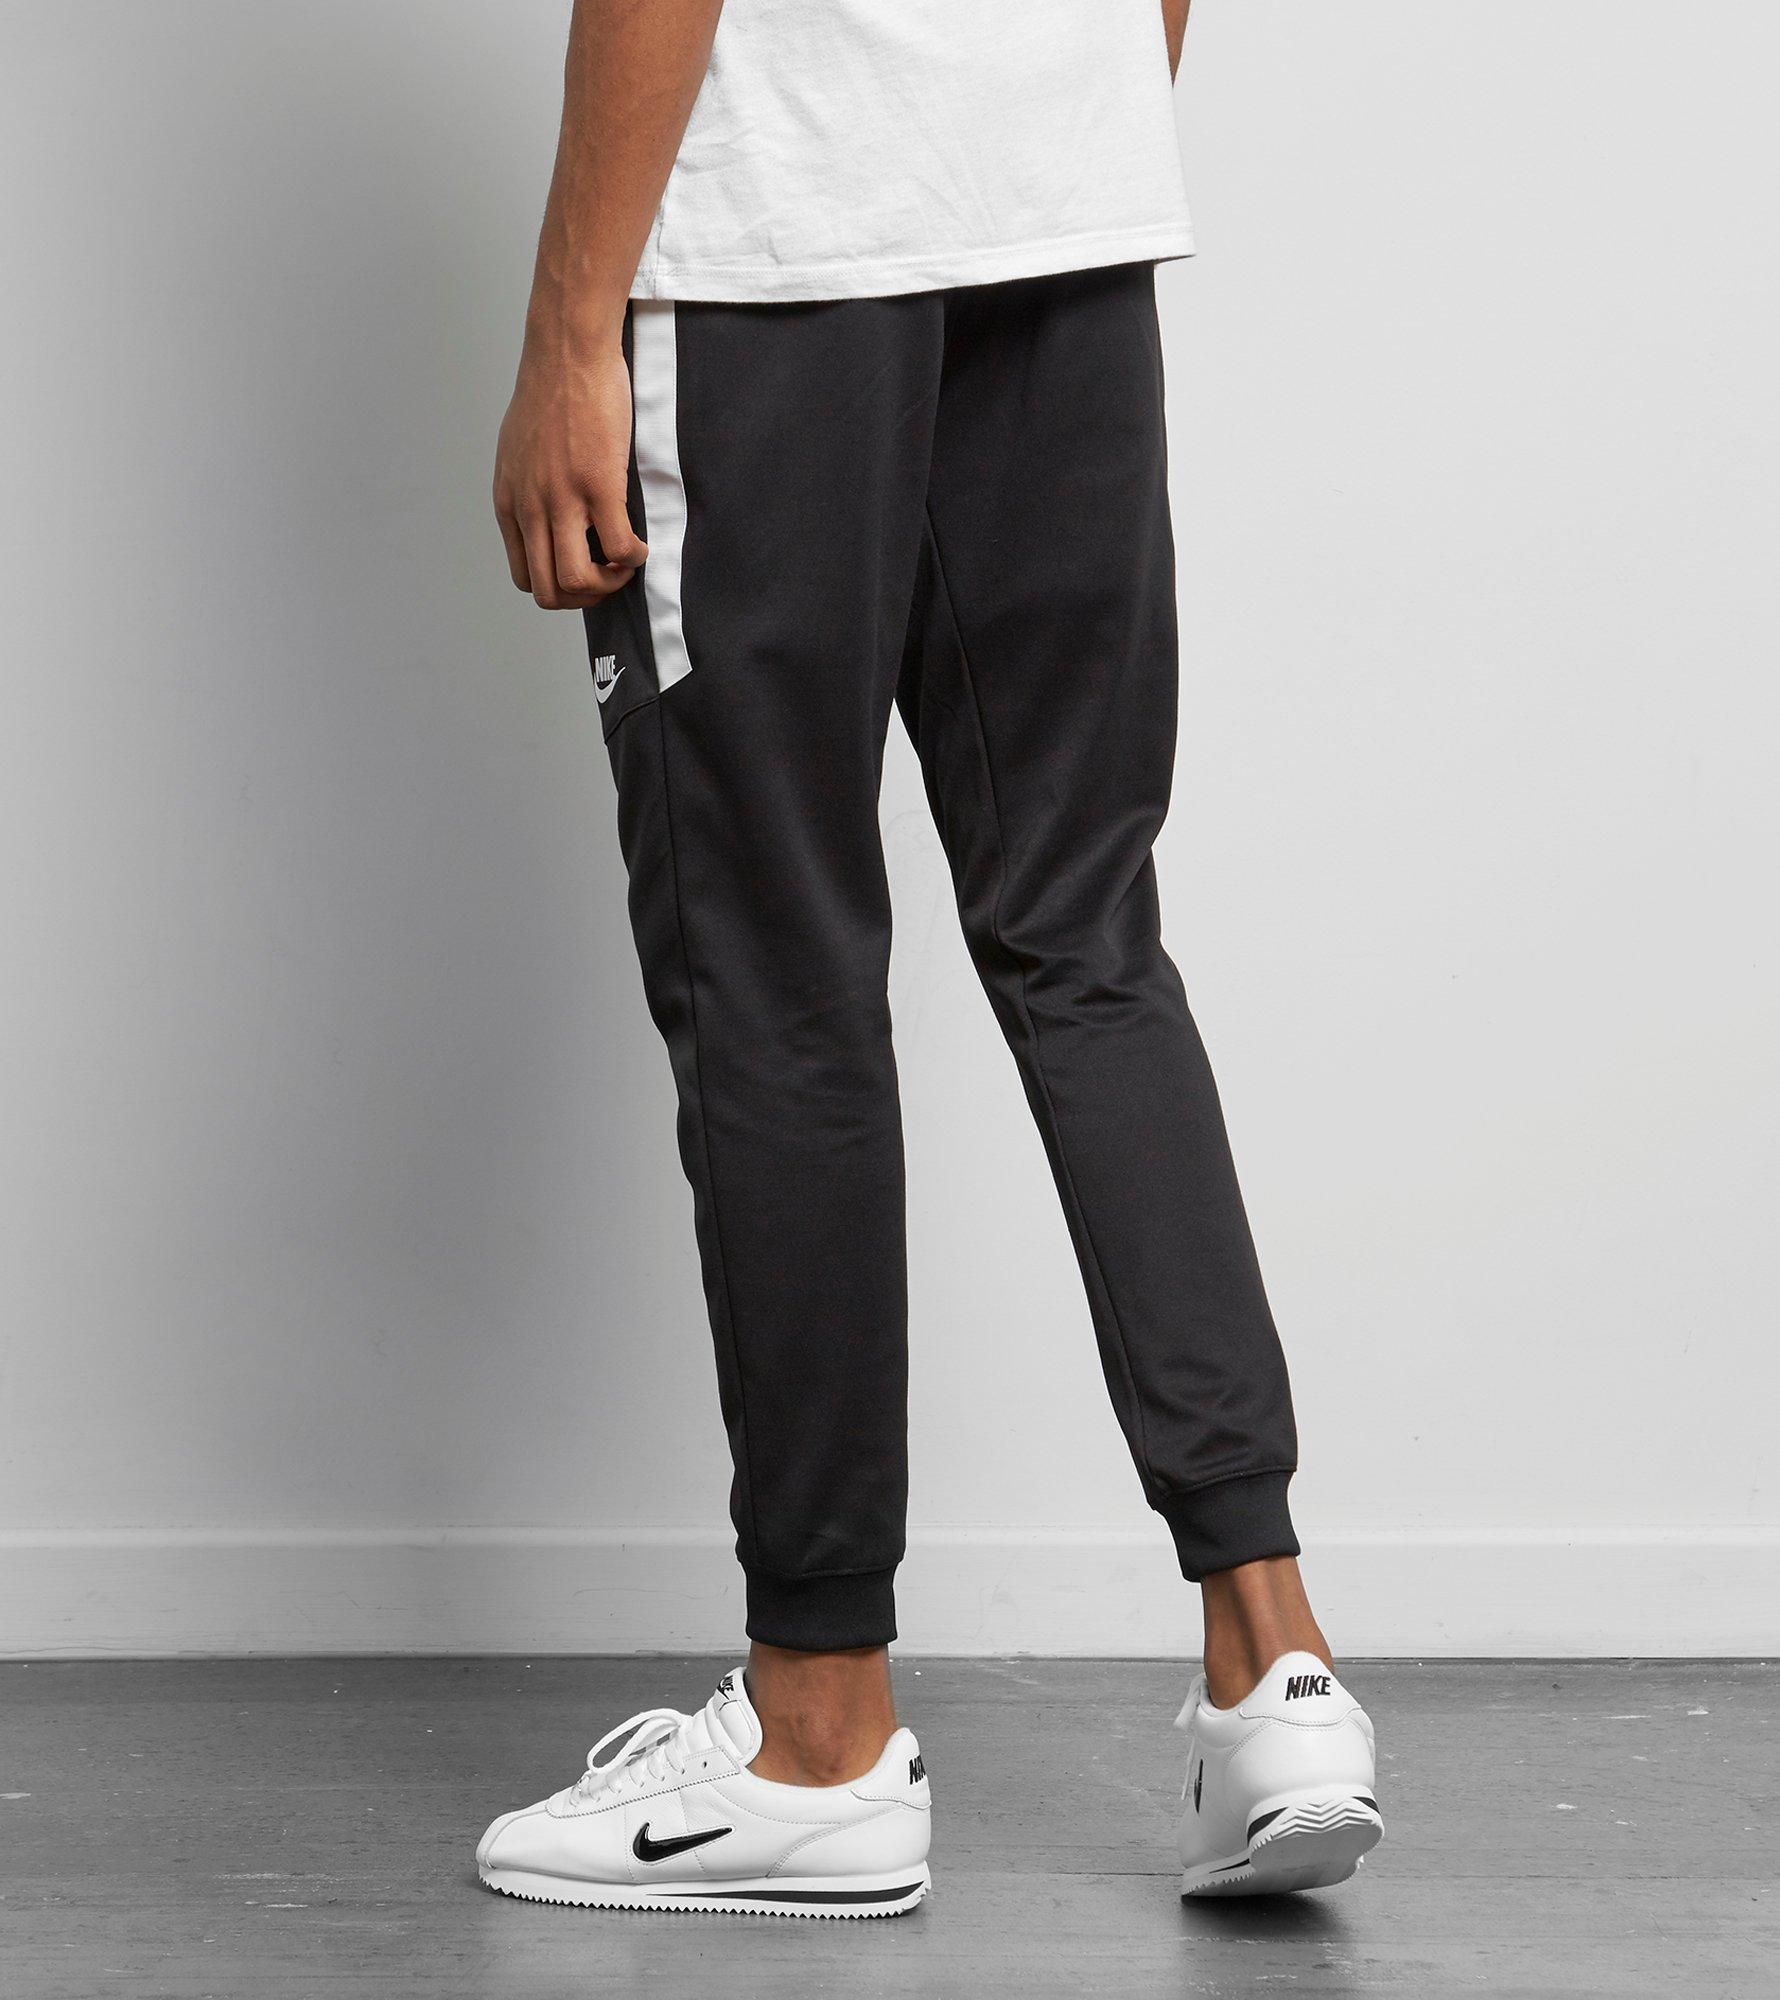 pantalon de survetement nike 092bb1ac884